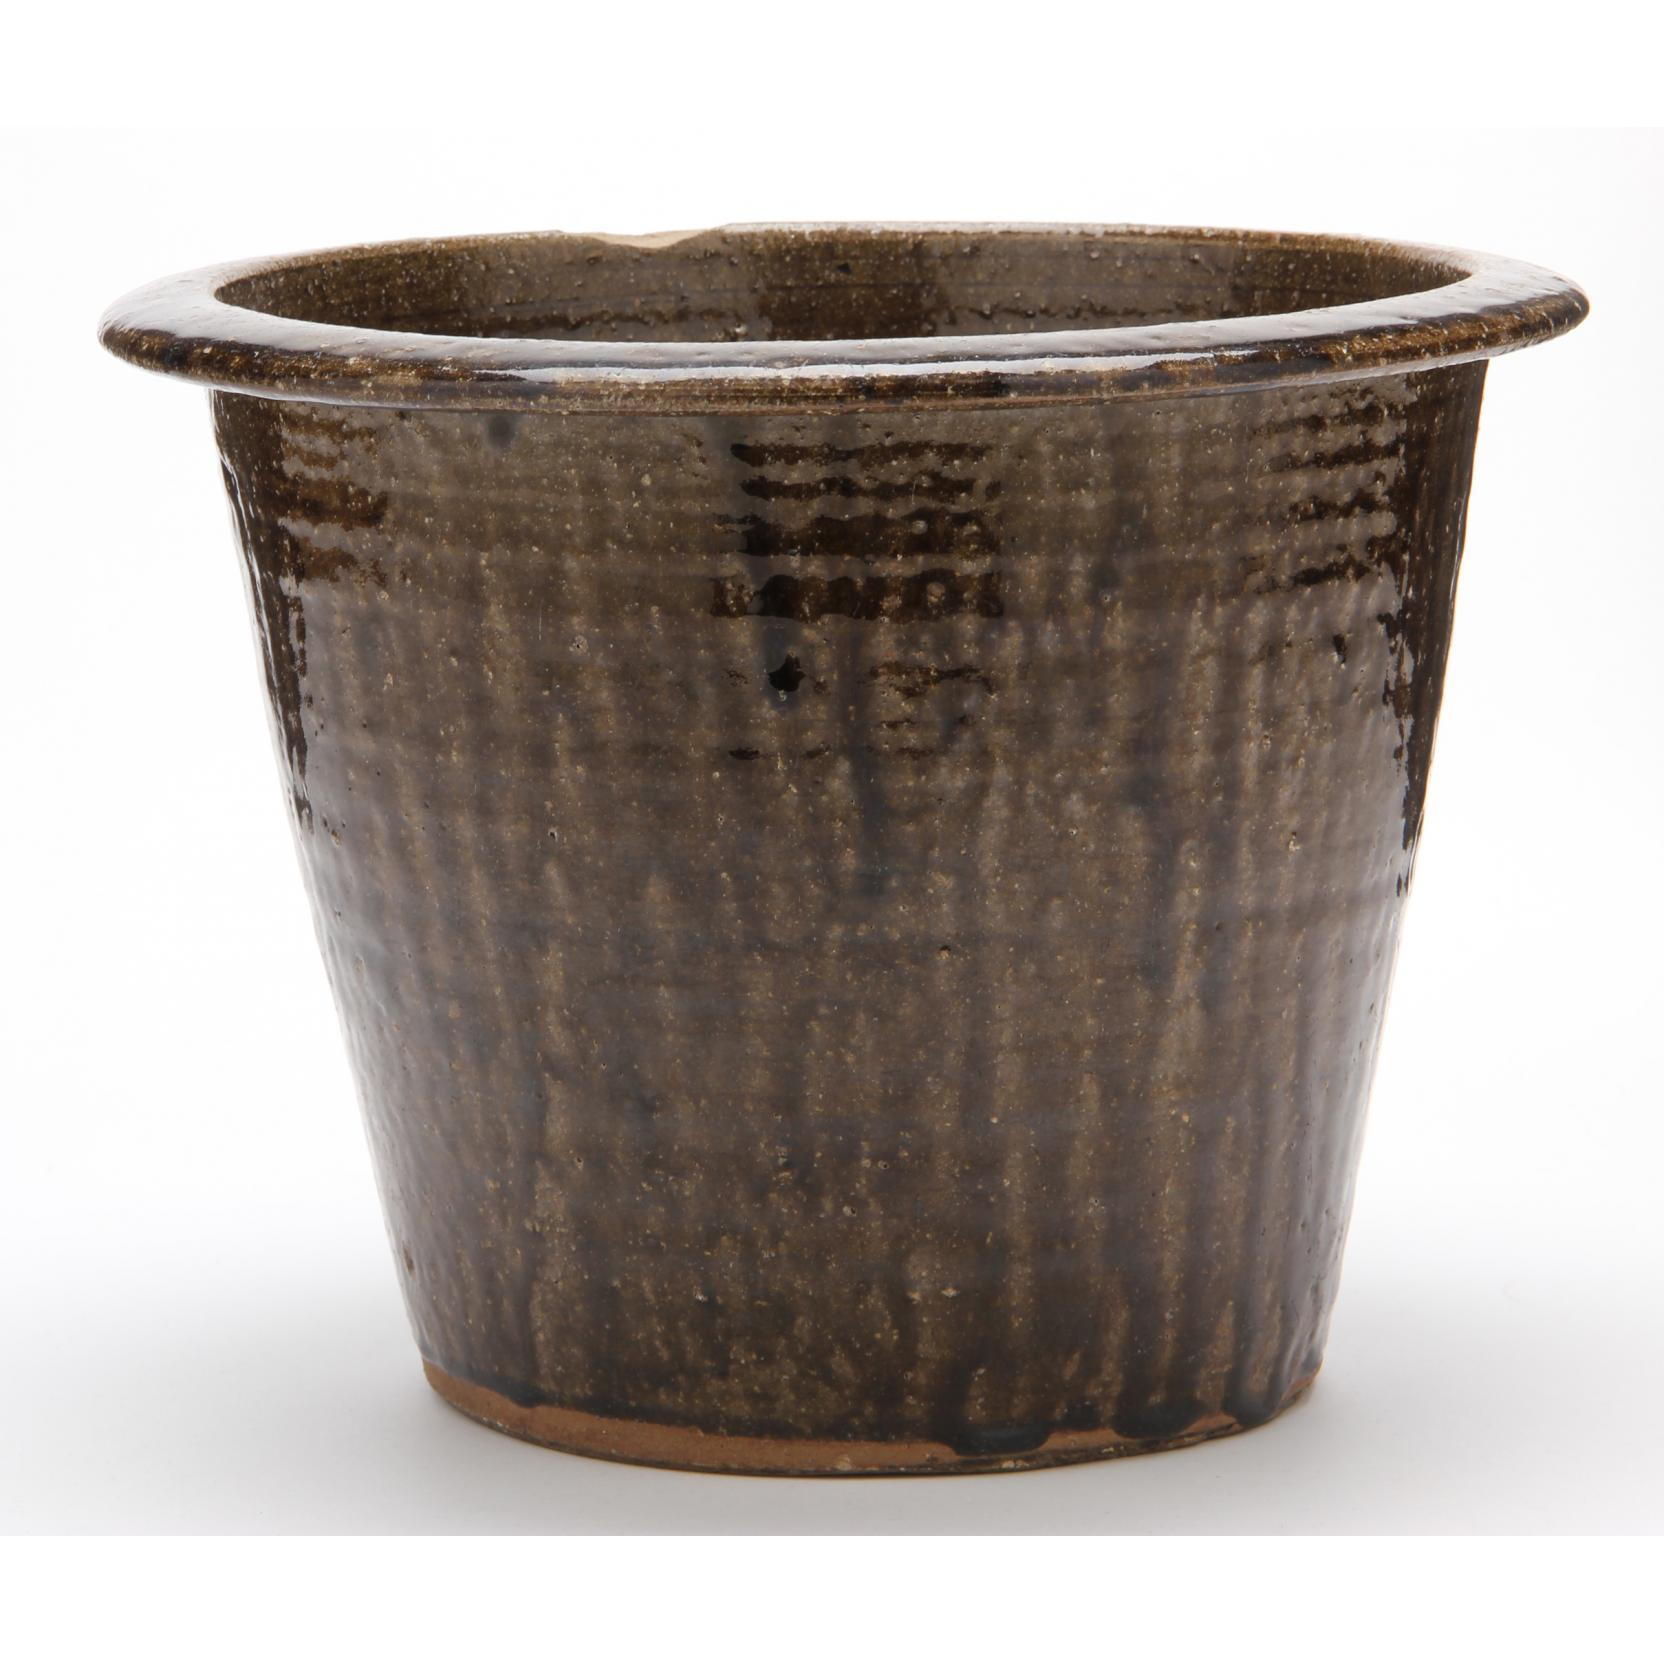 nc-pottery-two-gallon-milk-crock-propst